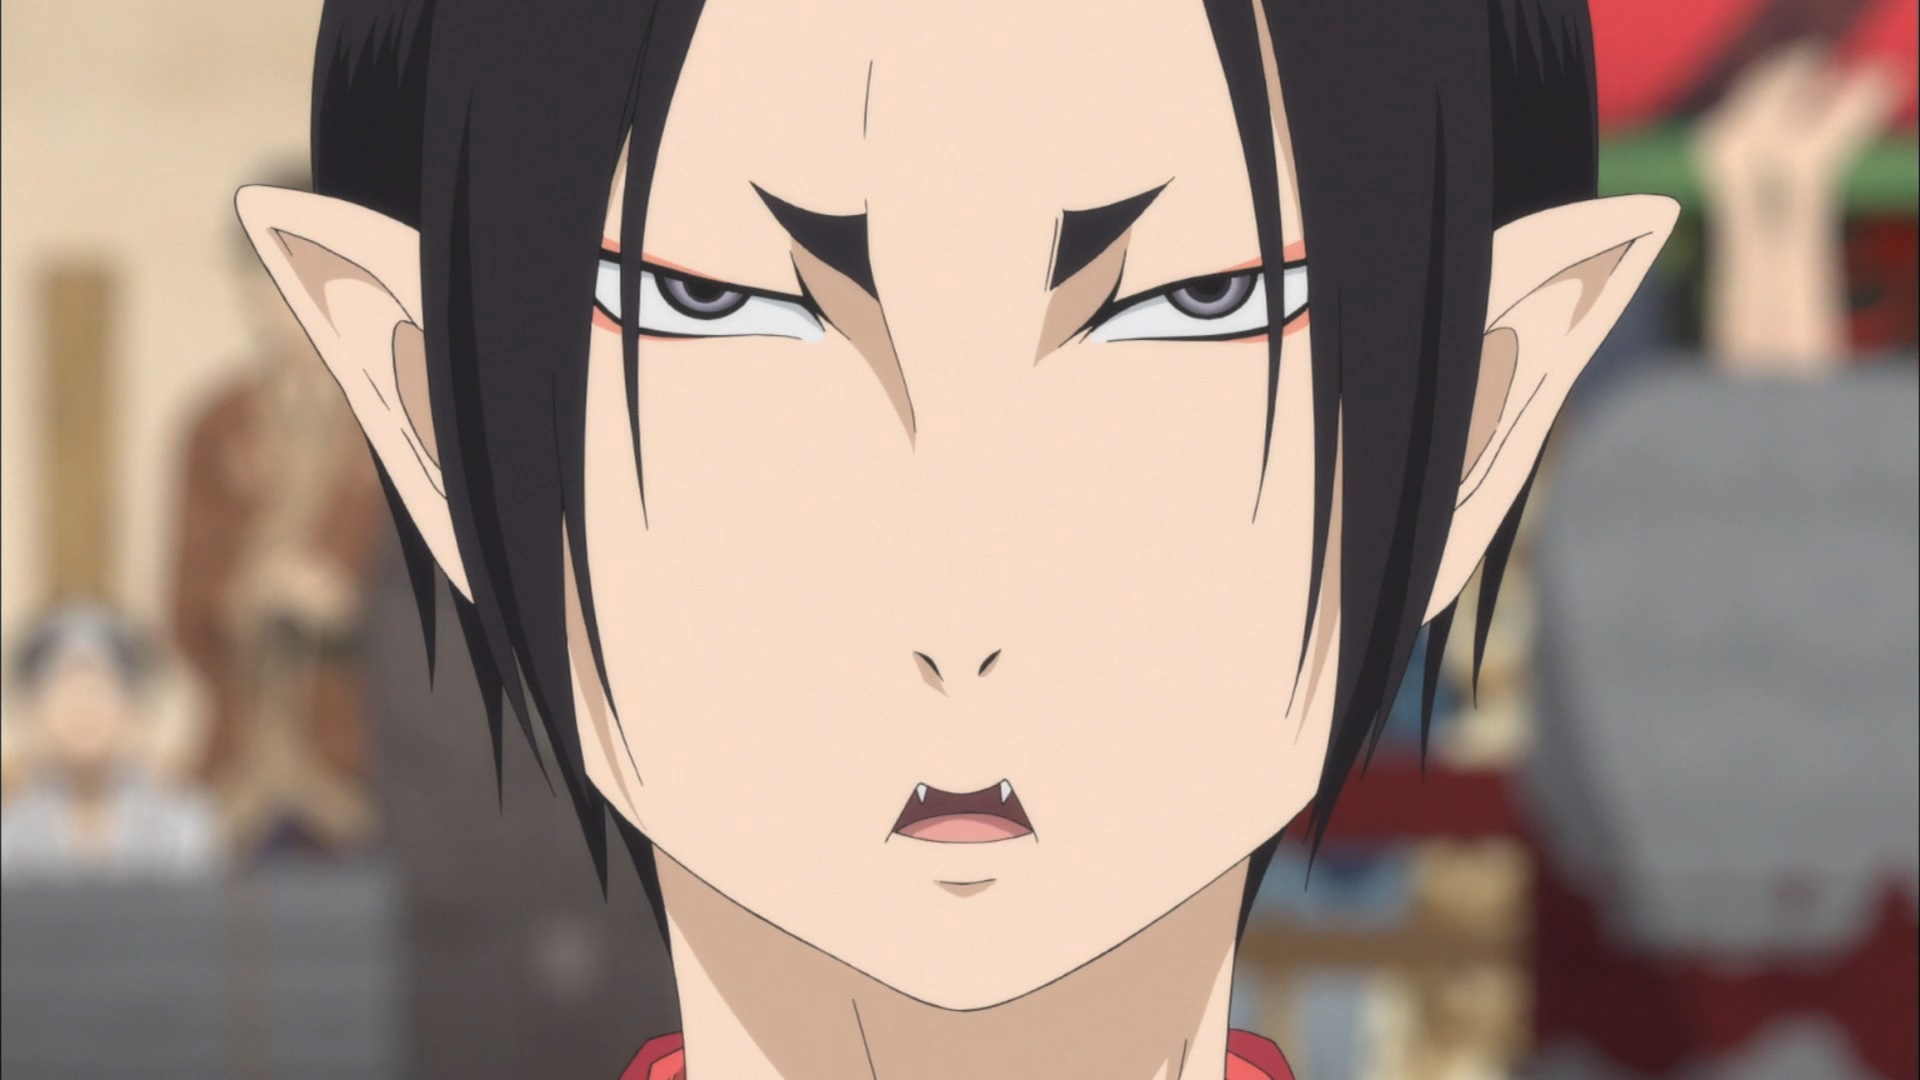 Hozuki, a demonic administrator, is all business in a scene from the Hozuki's Coolheadedness TV anime.